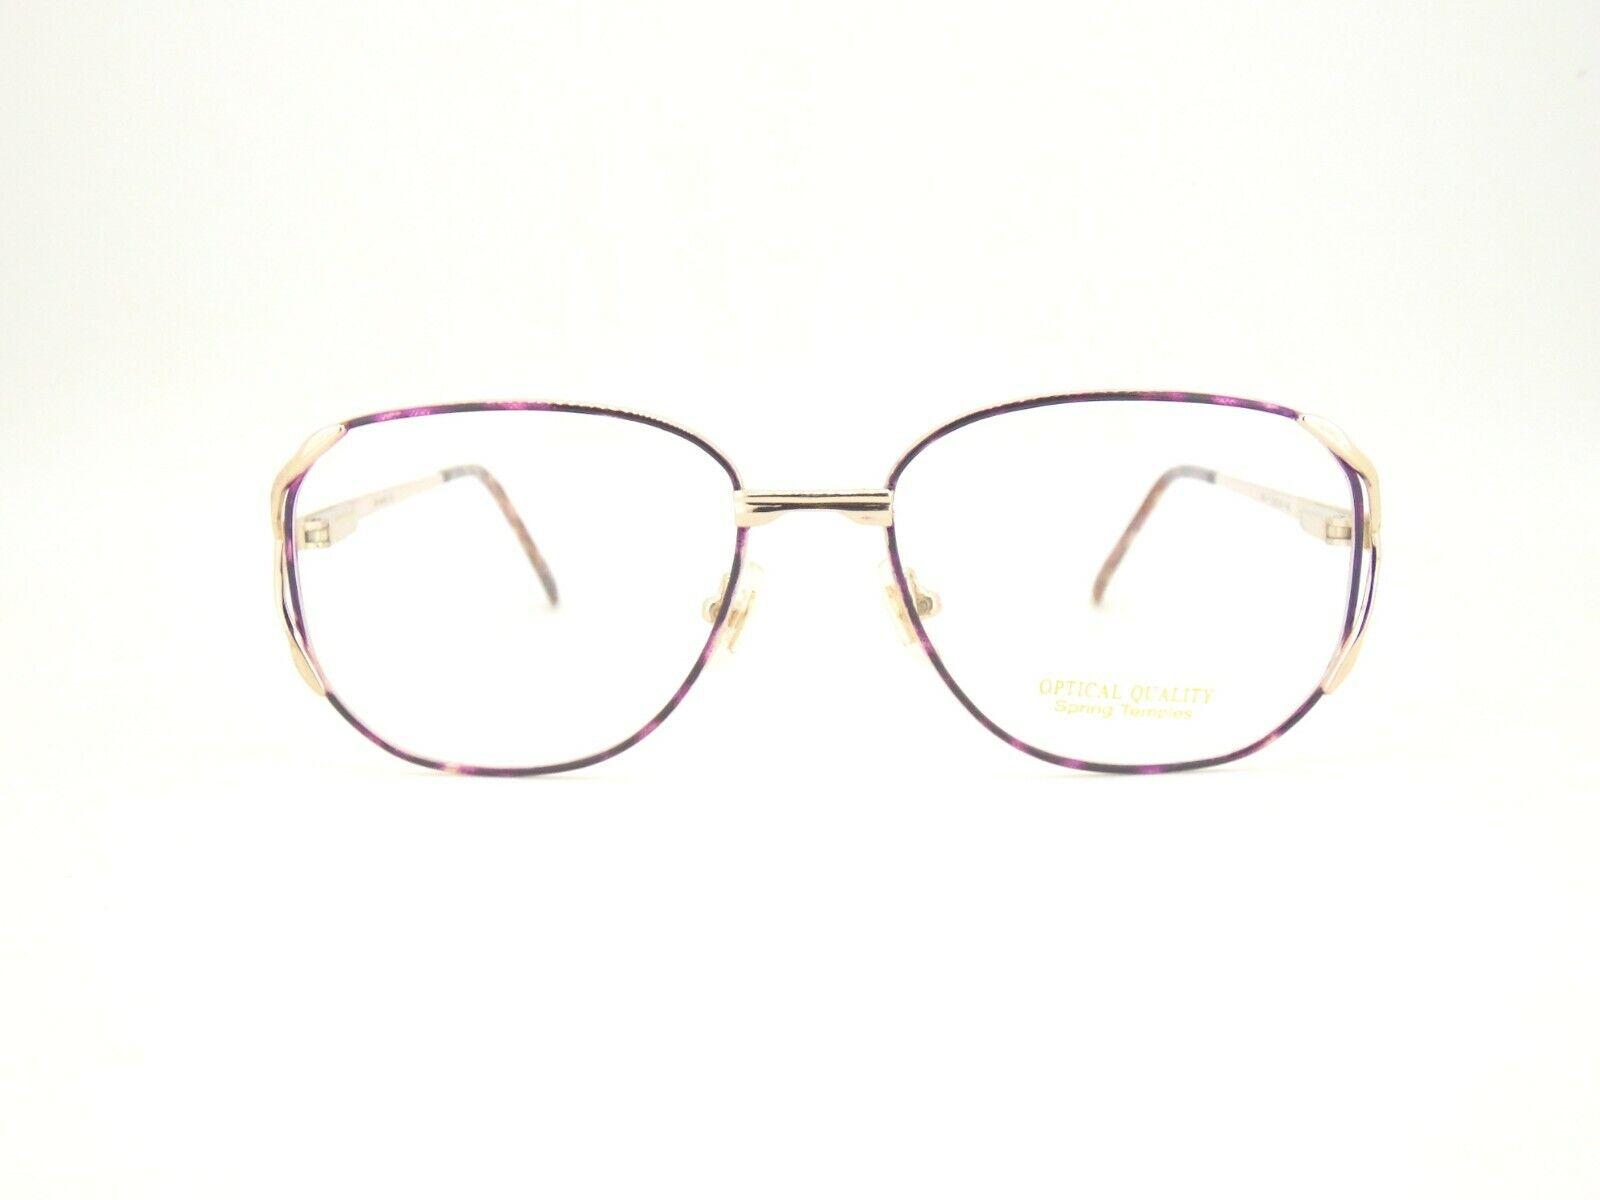 VINTAGE Designer Eyeglasses Brille goggles gafas SUNOPTIC 99-F NEU NEW